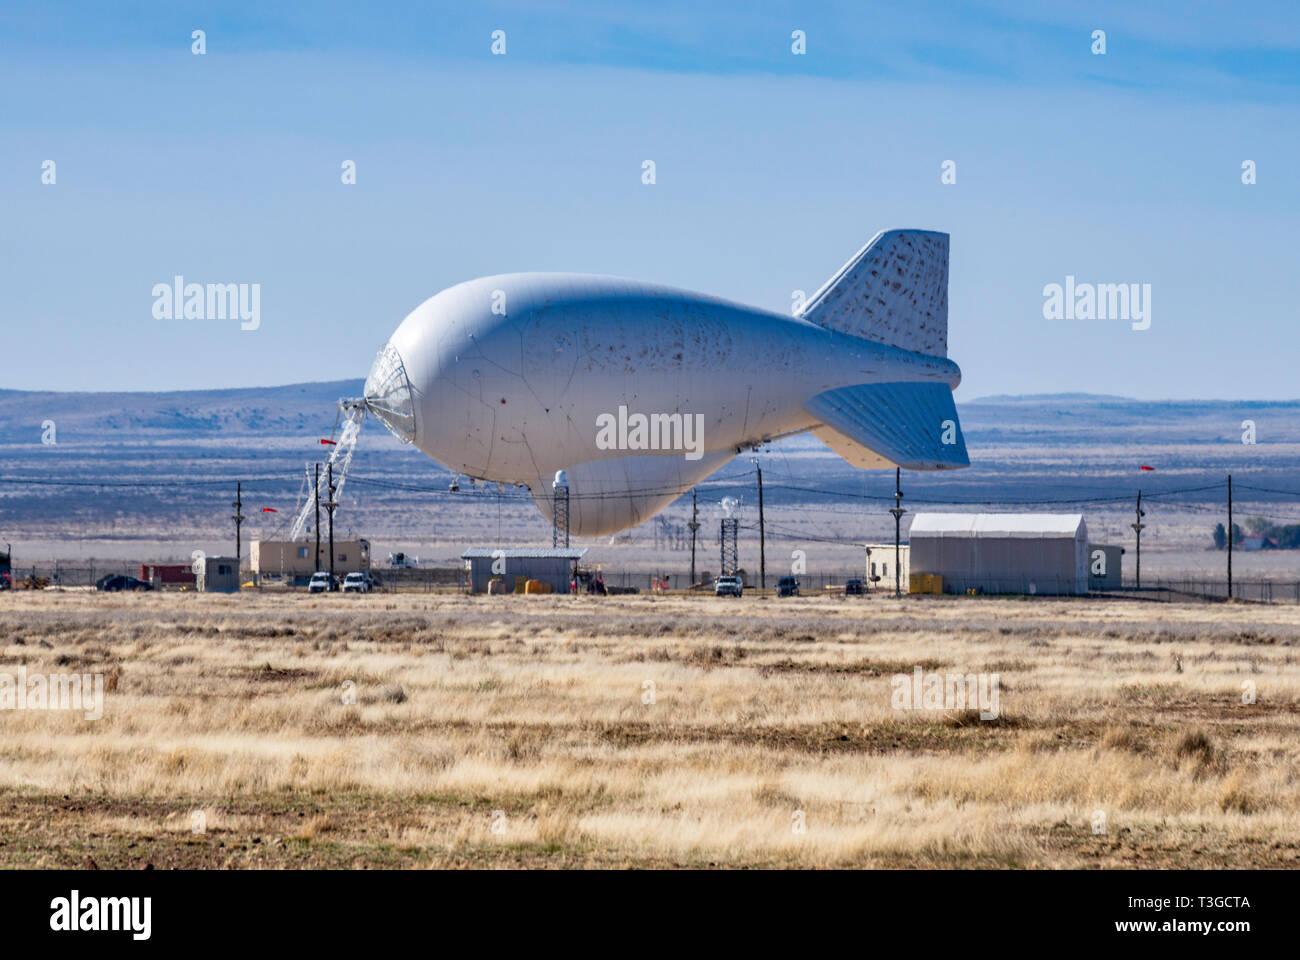 Lockheed Martin 420K aerostat, TARS, or Tethered Aerostat Radar System, helium-filled balloon with downward-looking radar for drug smugglers aircraft  - Stock Image